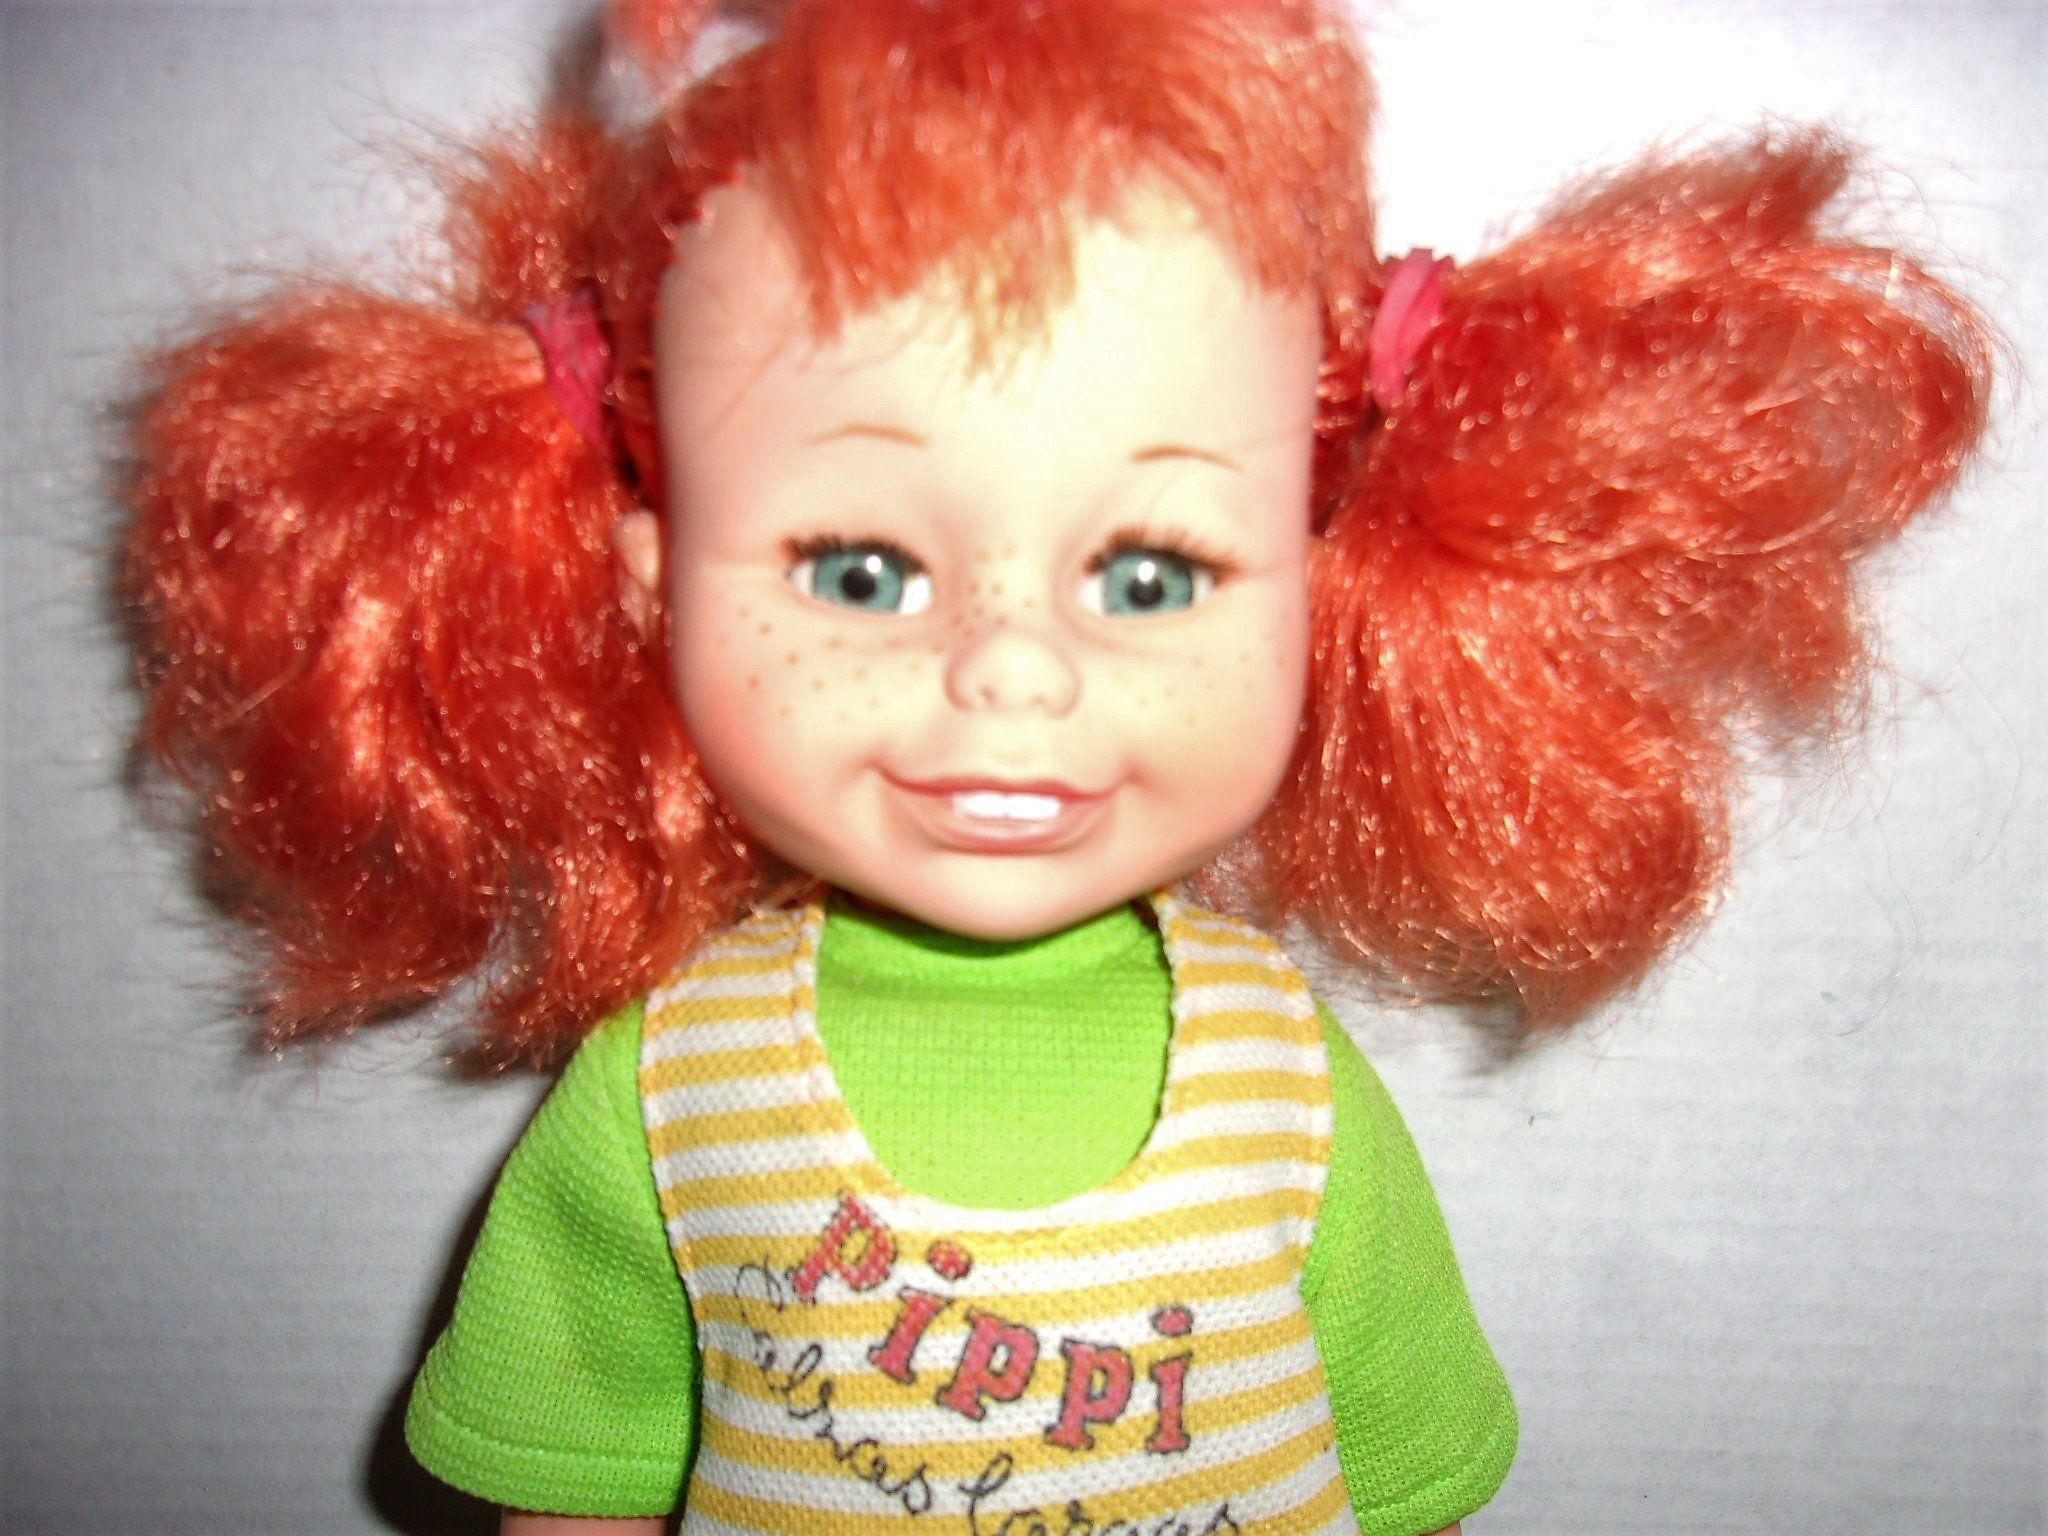 Vintage 1970 s Swedish Pippi Longstocking Doll Made in Spain